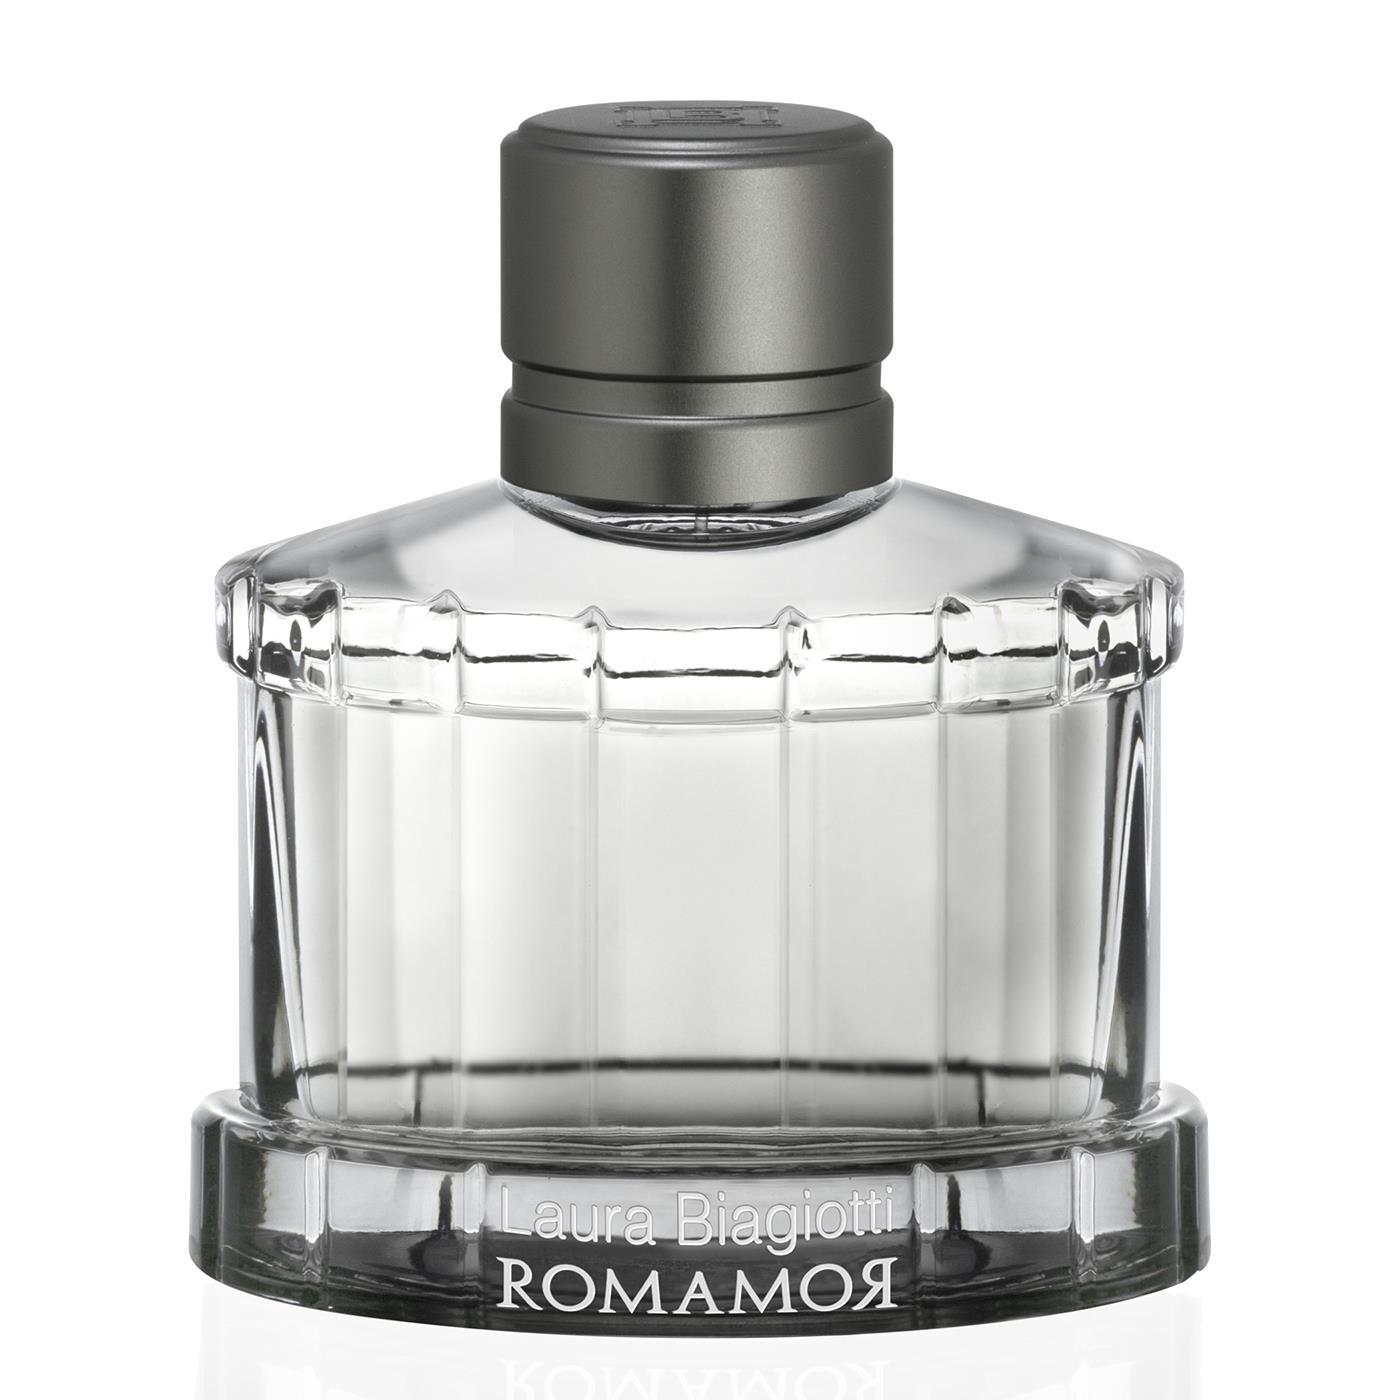 Laura Biagiotti Romamor Uomo EDT 125 ml Erkek Parfüm